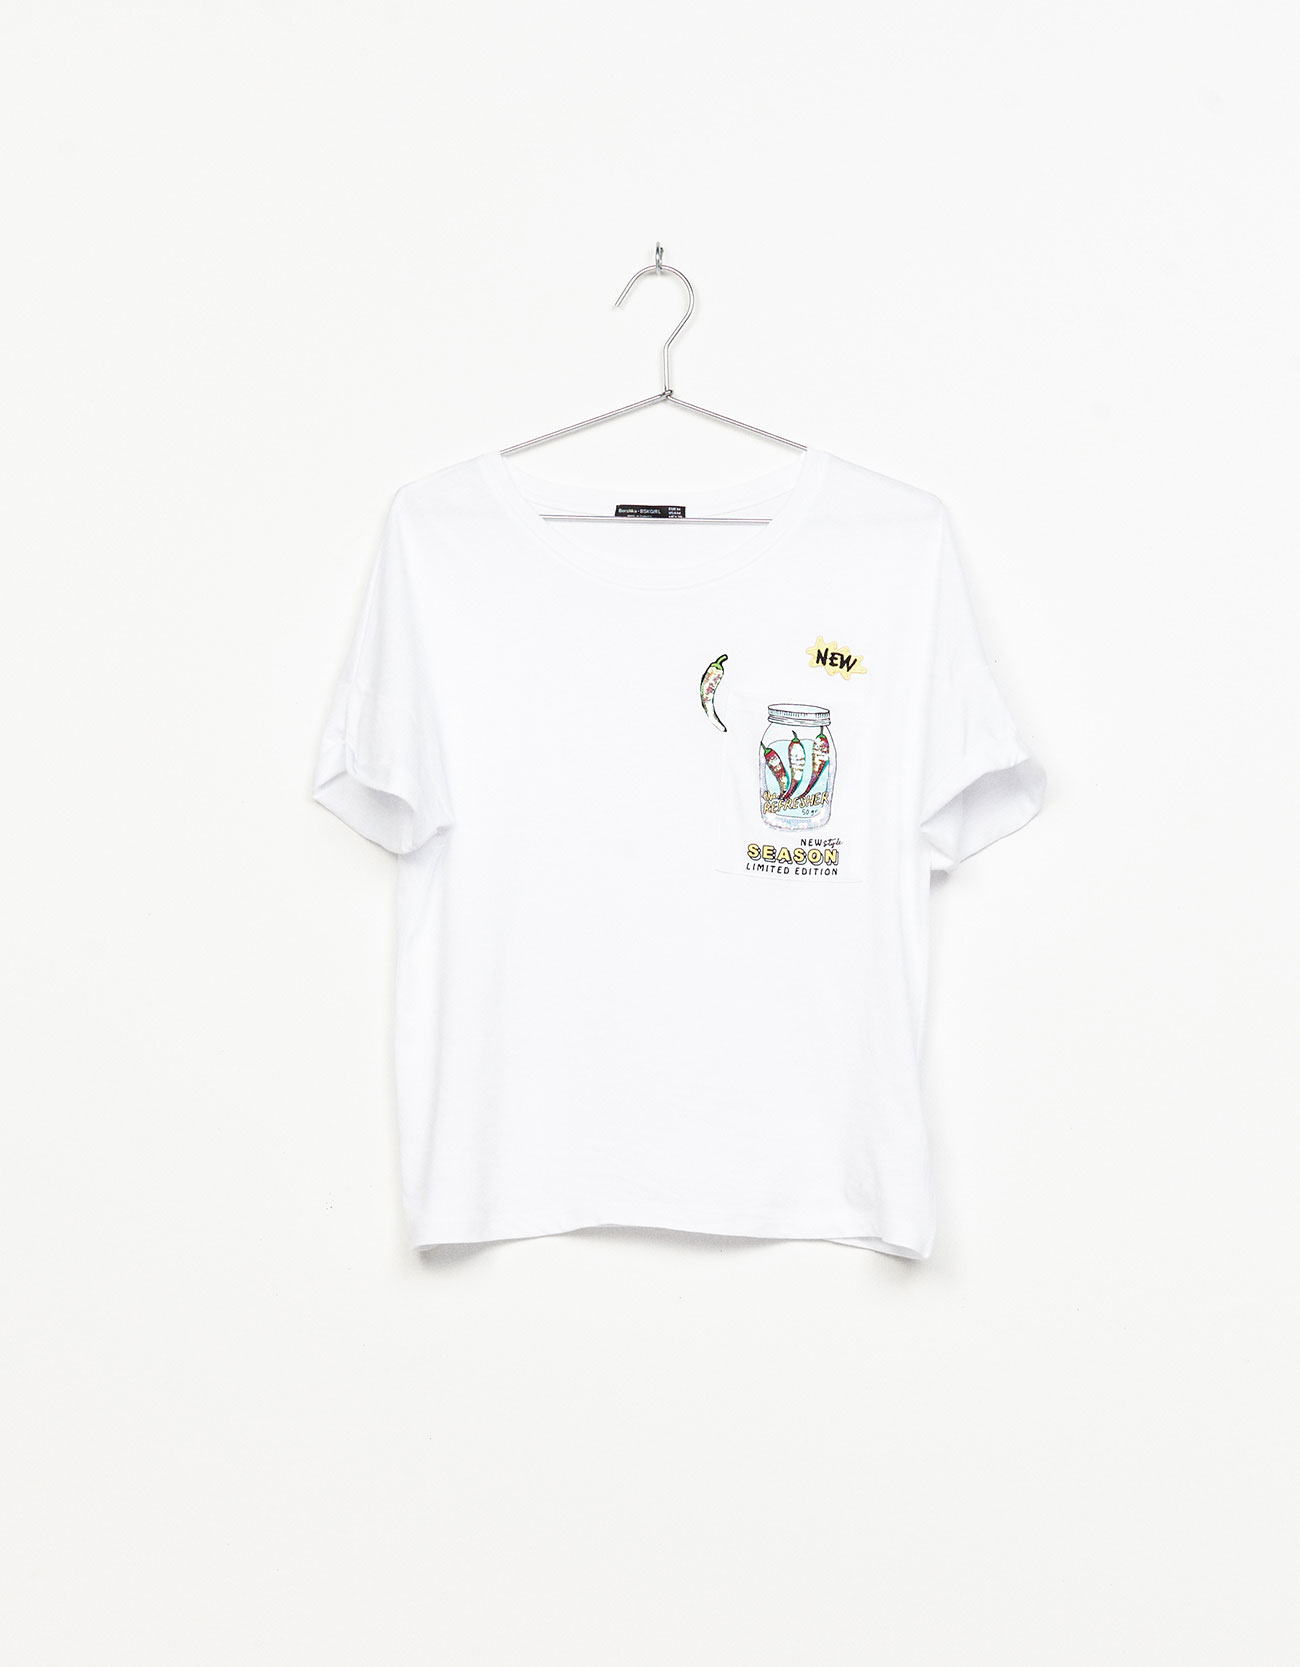 Sayuri Villalba – Bershka Embroidery – Print Design6